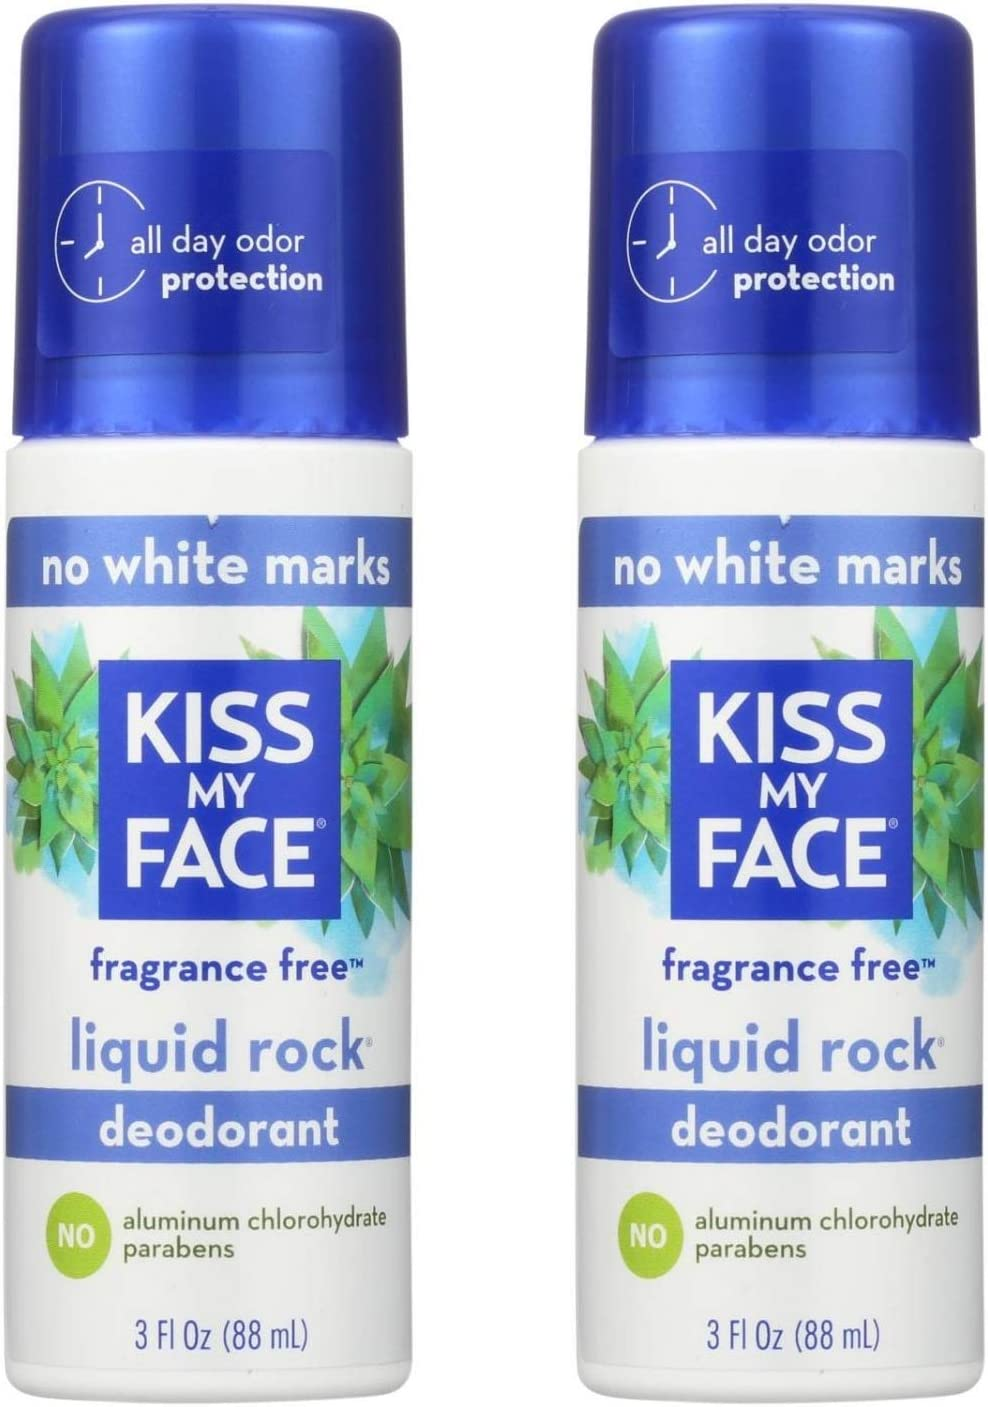 Kiss My Face, Natural Liquid Rock Deodorant, No Fragrance, 3 fl oz (88 Milliliter). Pack of 2